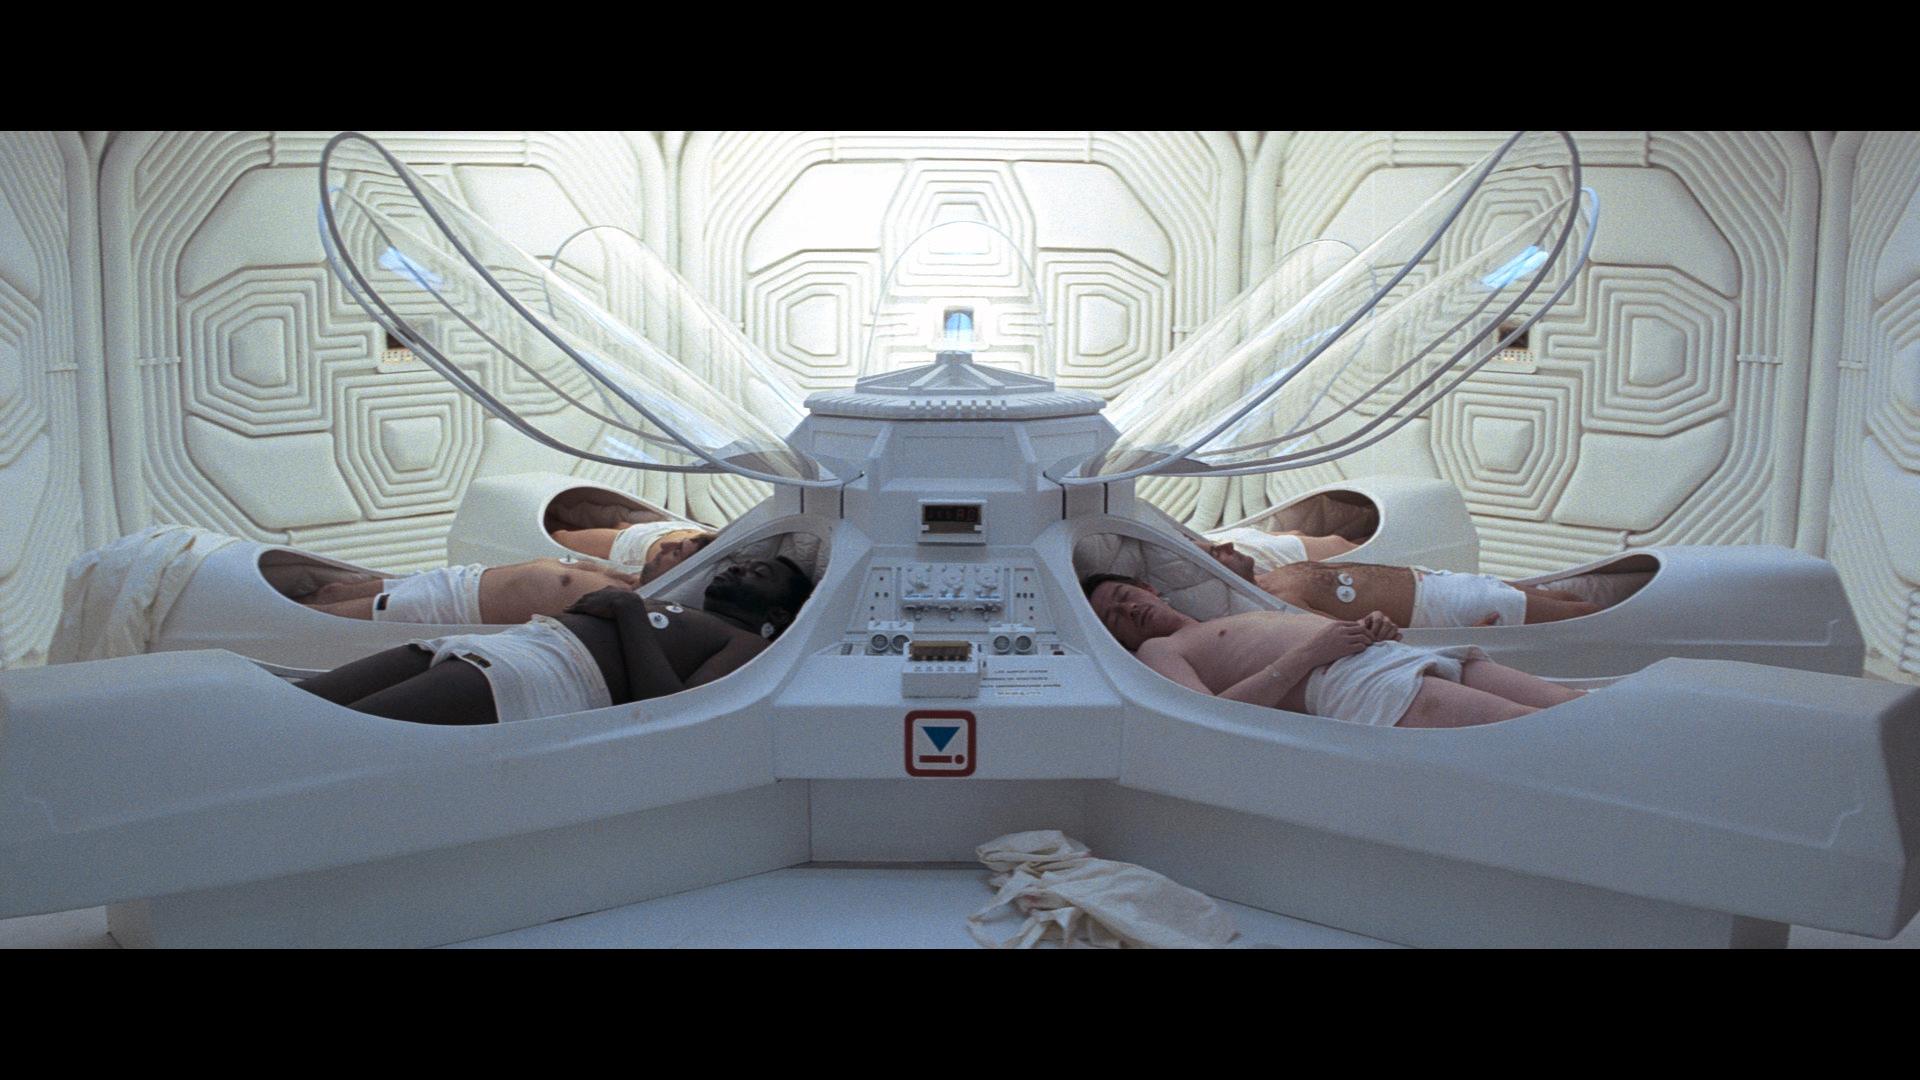 Passengers during the flight filmed three alien ships